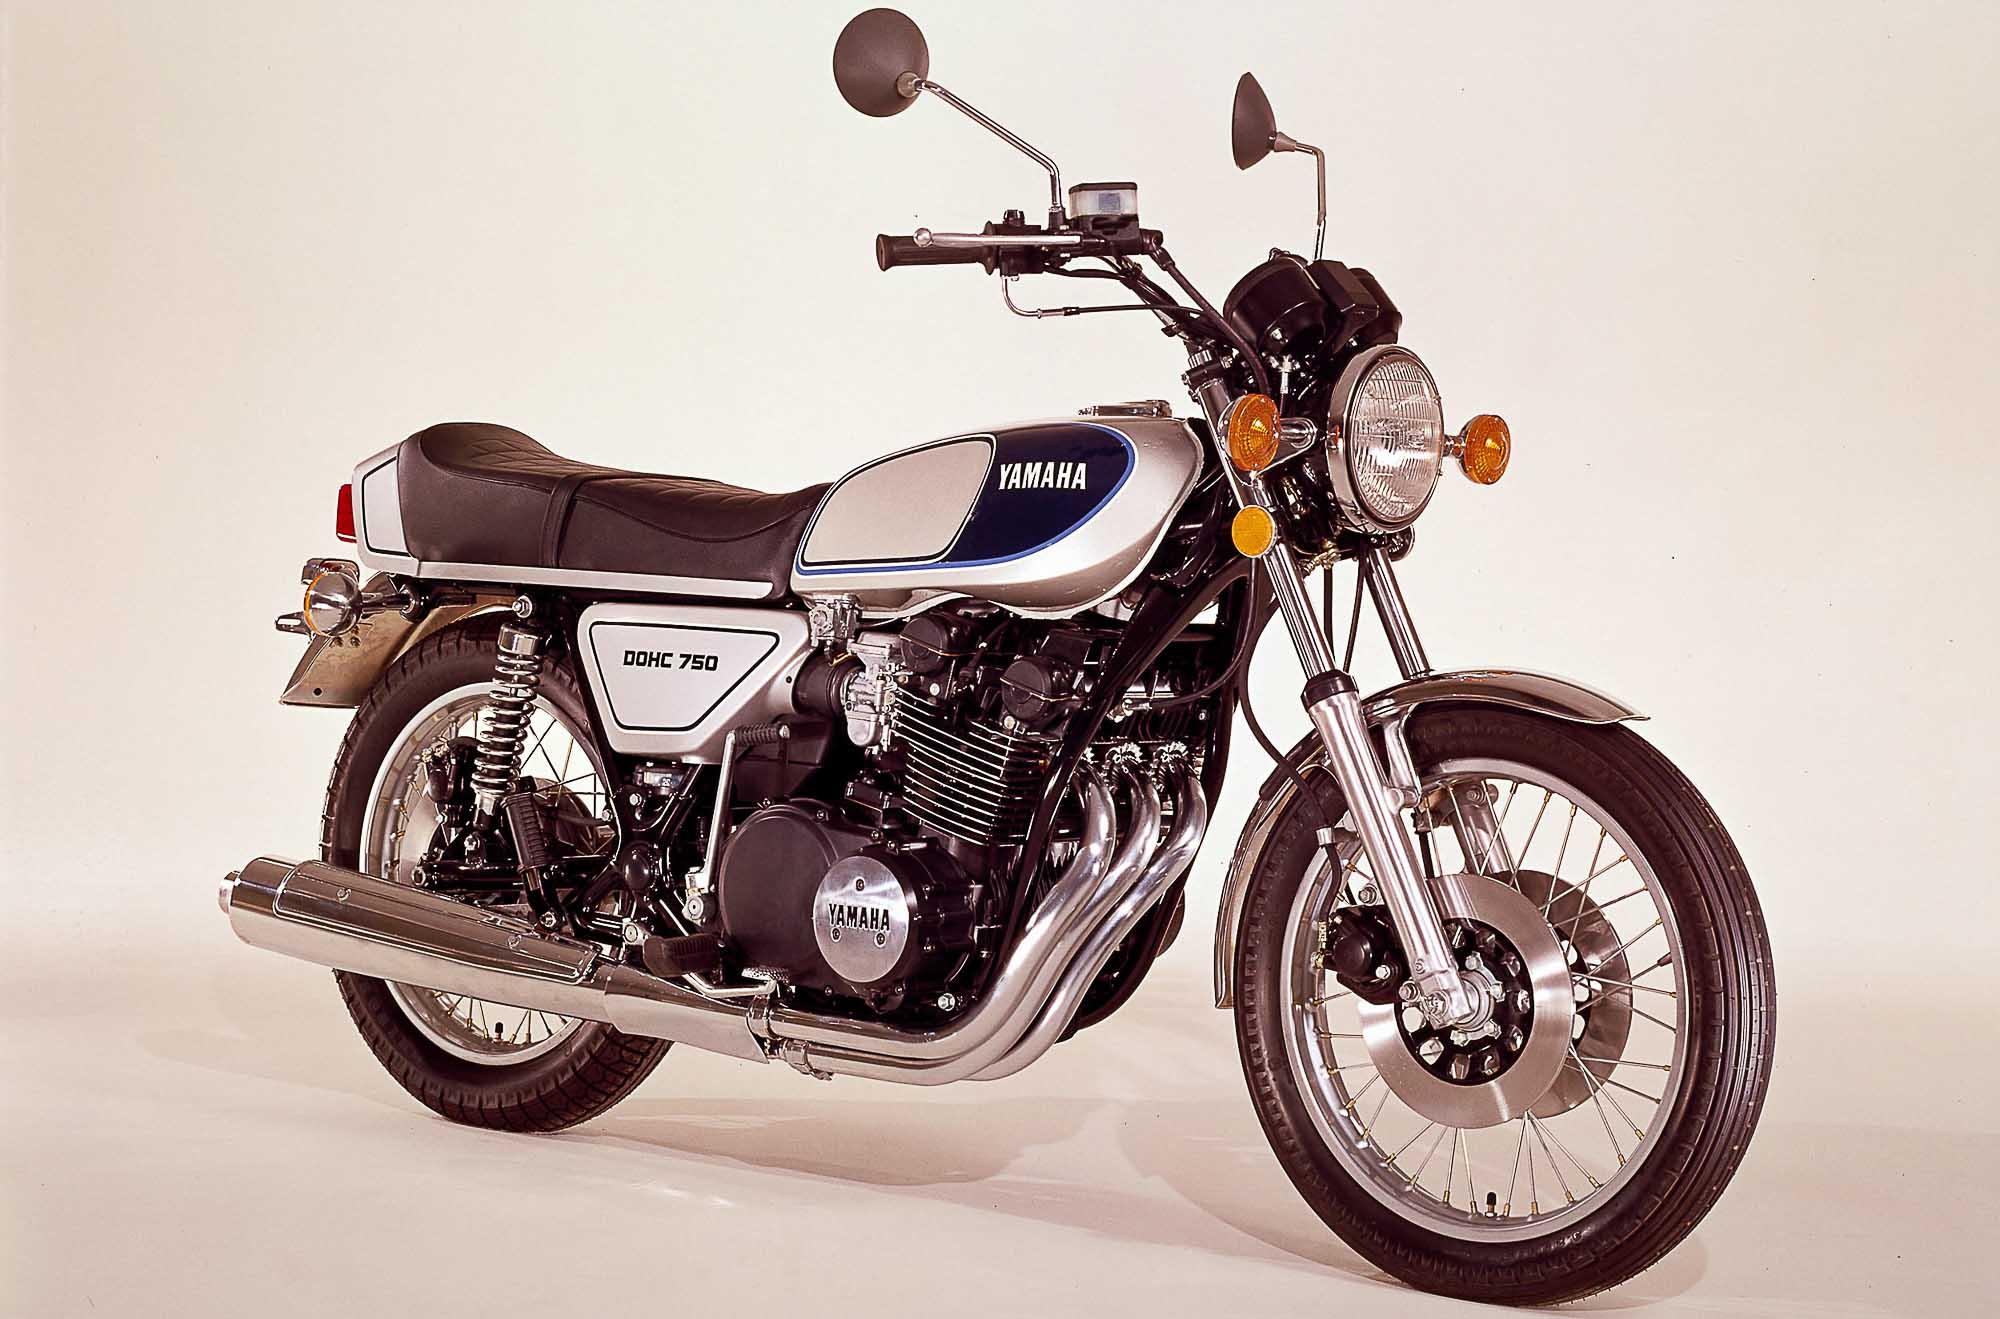 YAMAHA XS 750 (1977 - 1980)